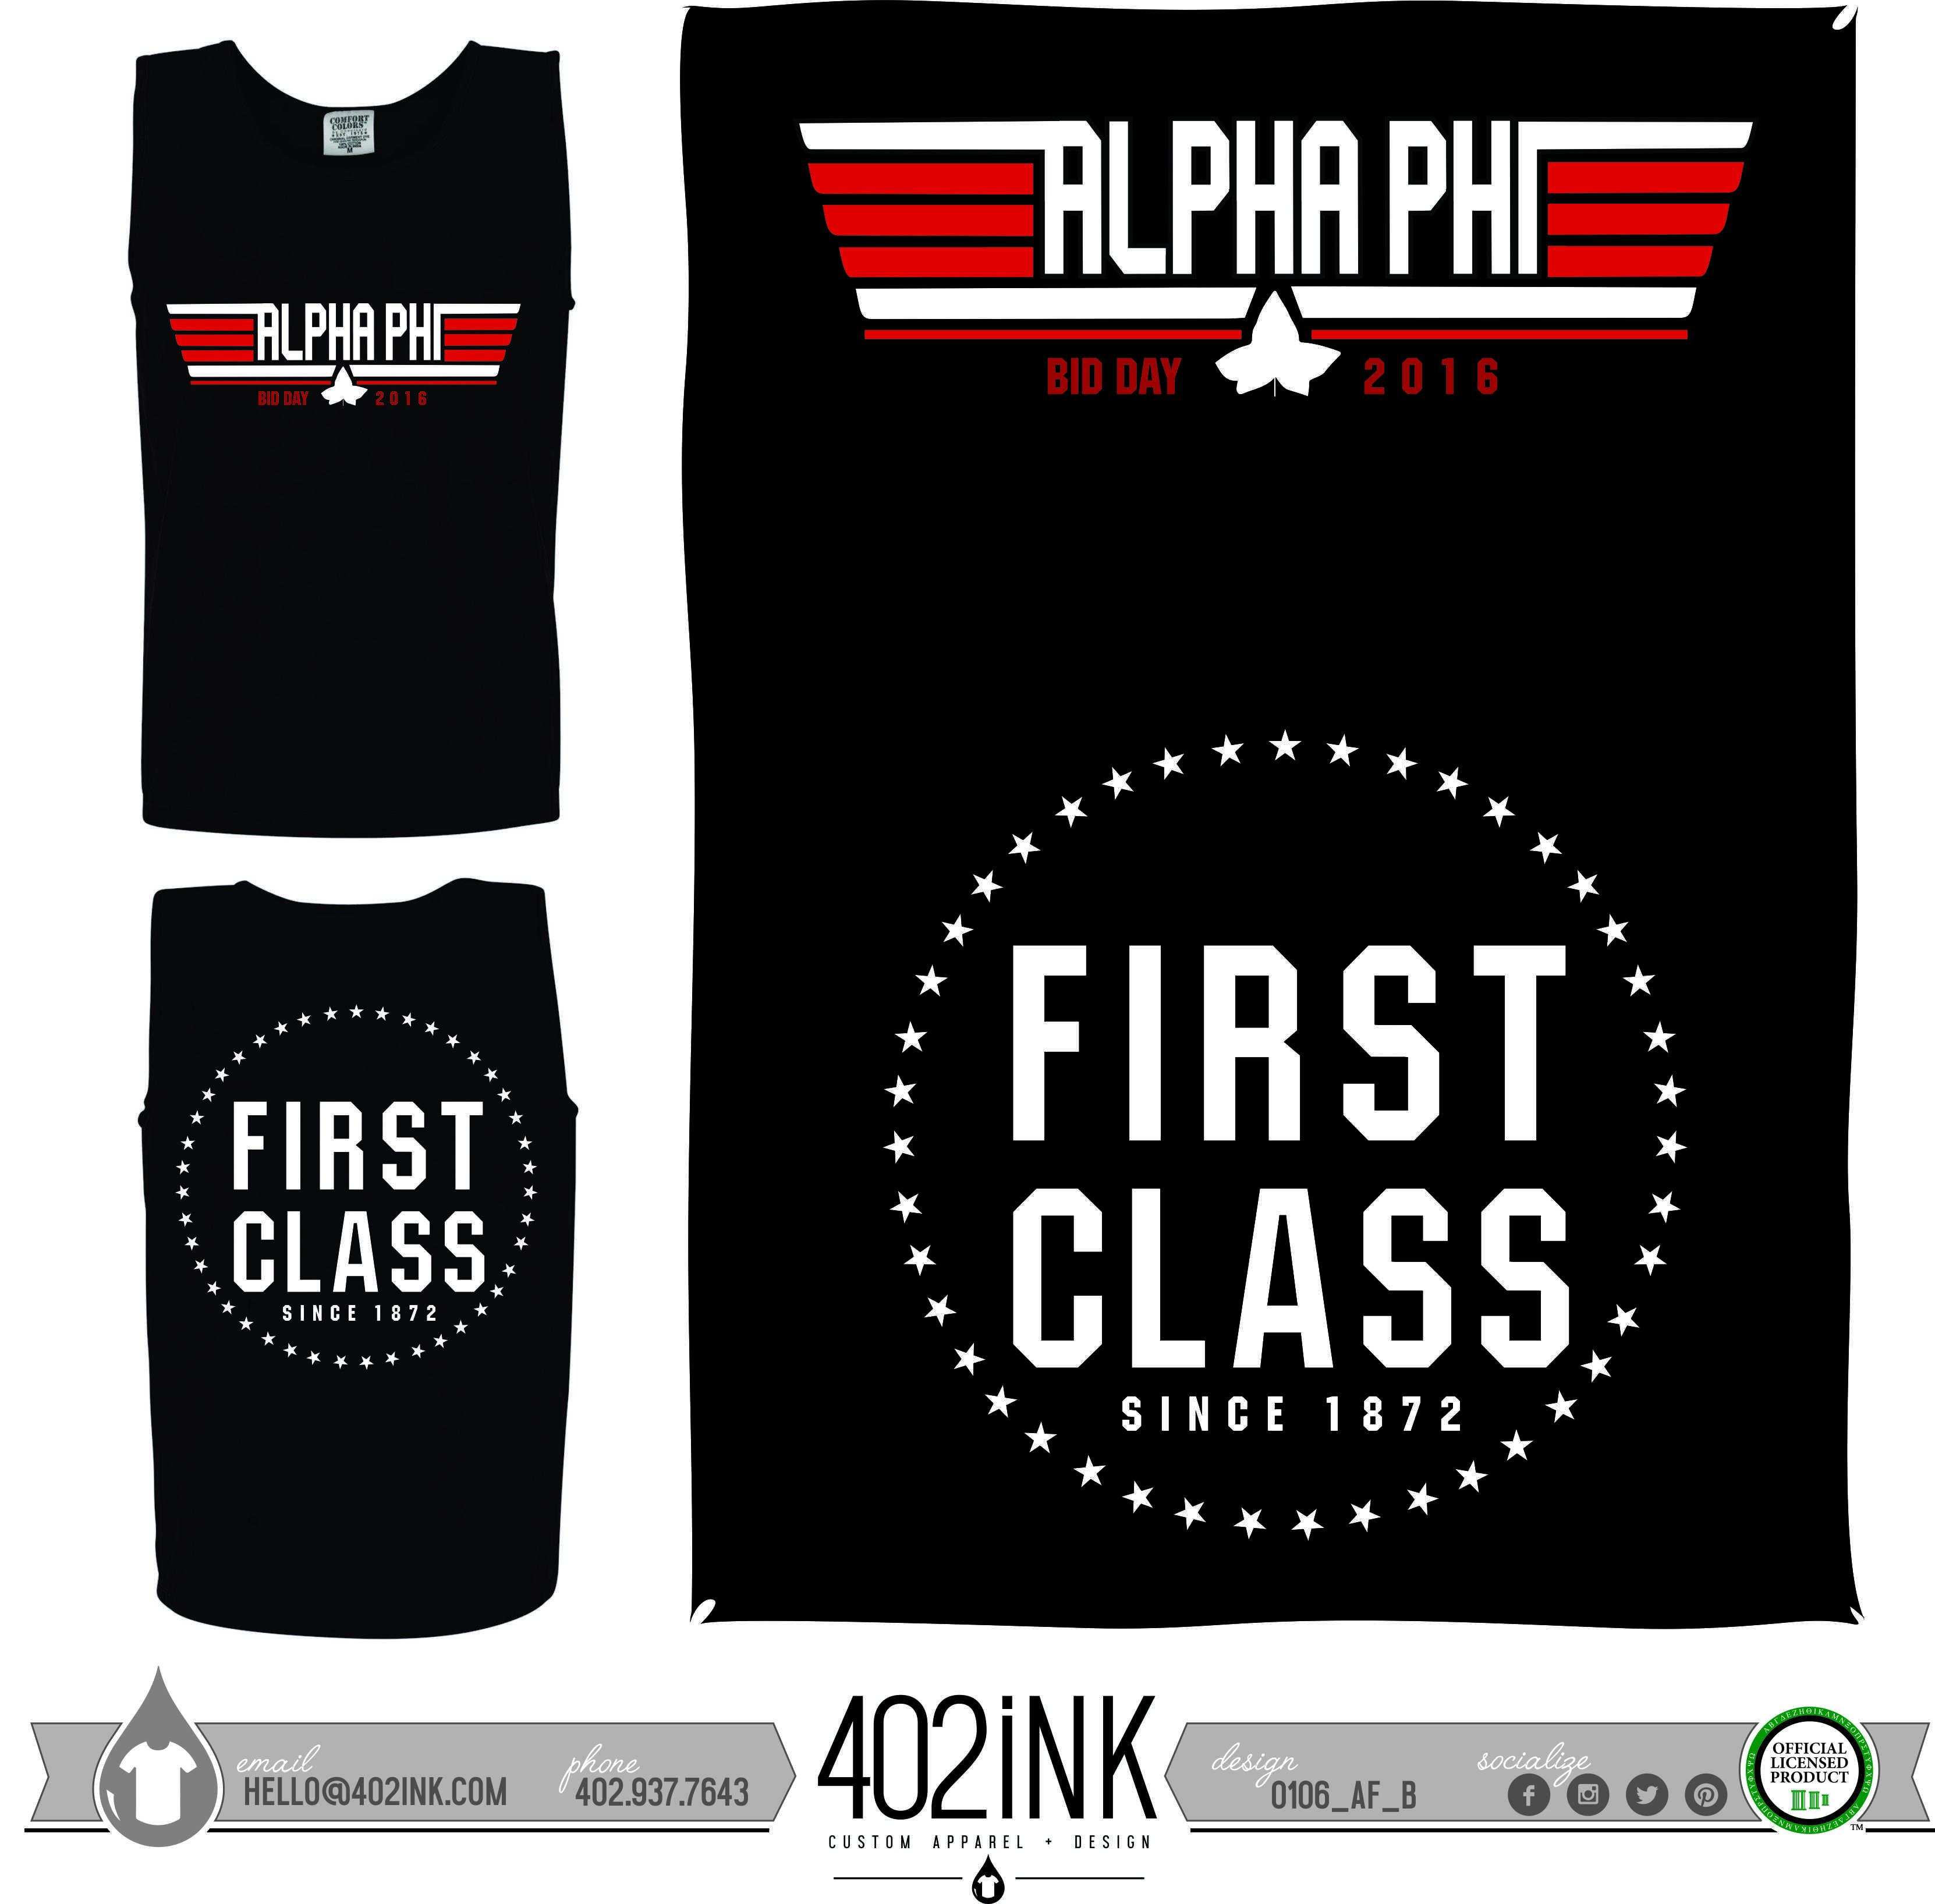 Design t shirt for class -  402ink 402style 402ink Custom Apparel Greek T Shirts Sorority T